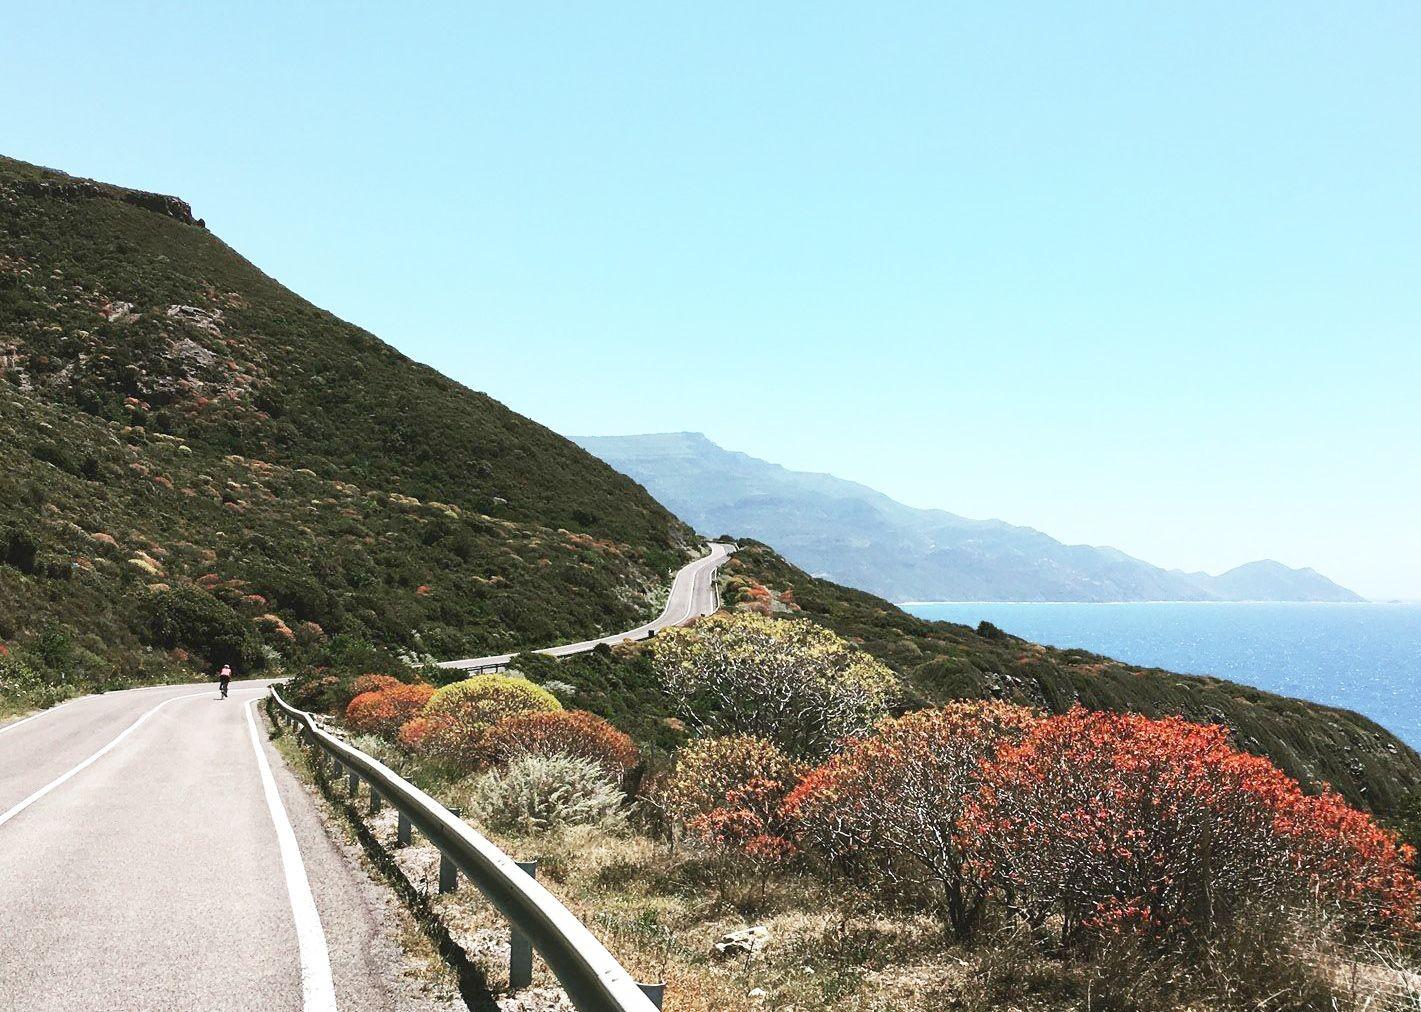 Road-Cycling-Holiday-Italy-Sardinia-Coastal-Explorer-Montiferru.jpg - Italy - Net Trade Rate - Coastal TranSardinia - Self-Guided Road Cycling Holiday - Italia Road Cycling